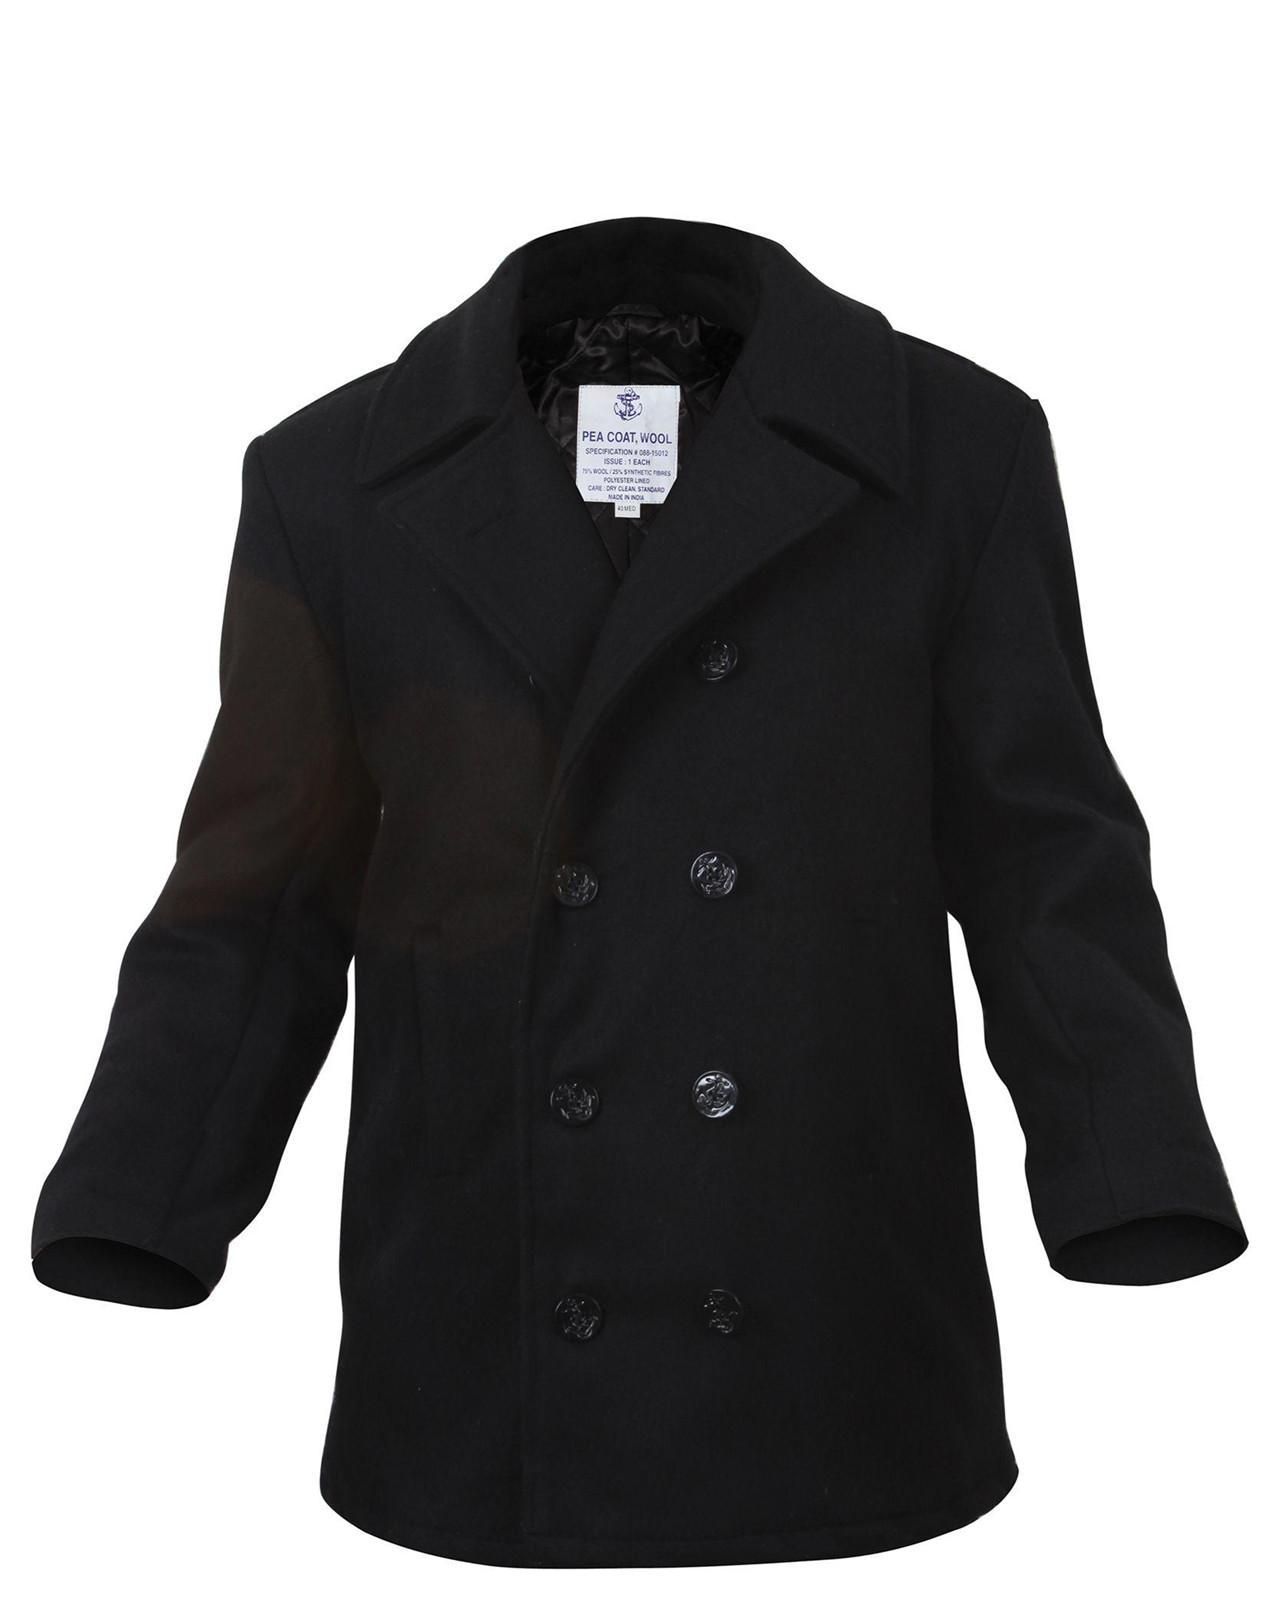 Rothco US Type Pea Coat (Svart, XS)